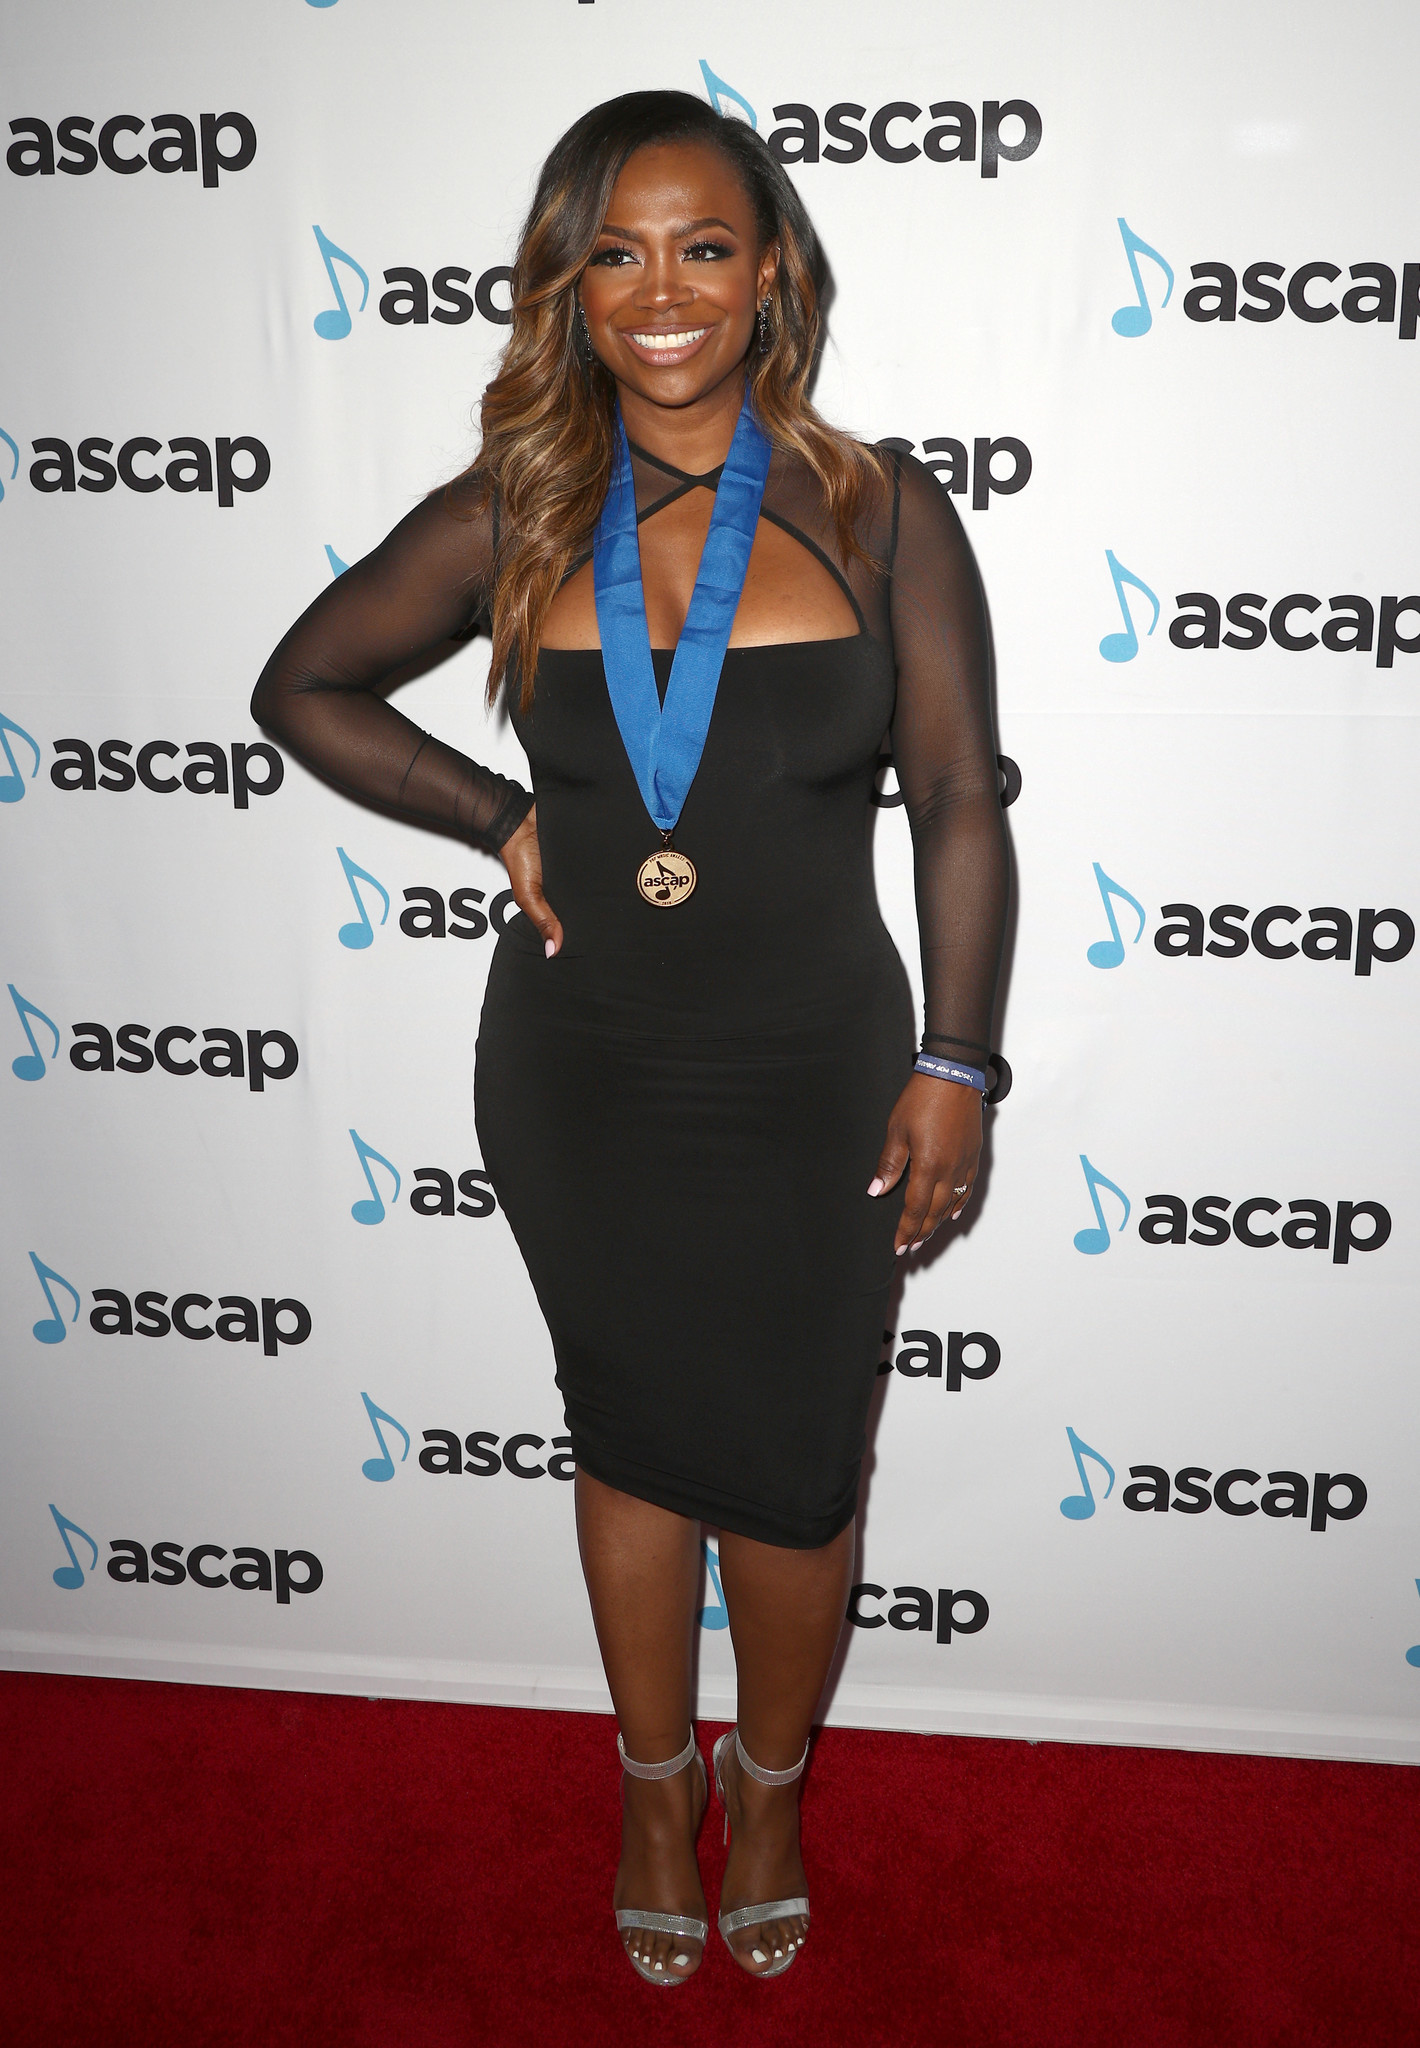 35th Annual ASCAP Pop Music Awards - Red Carpet